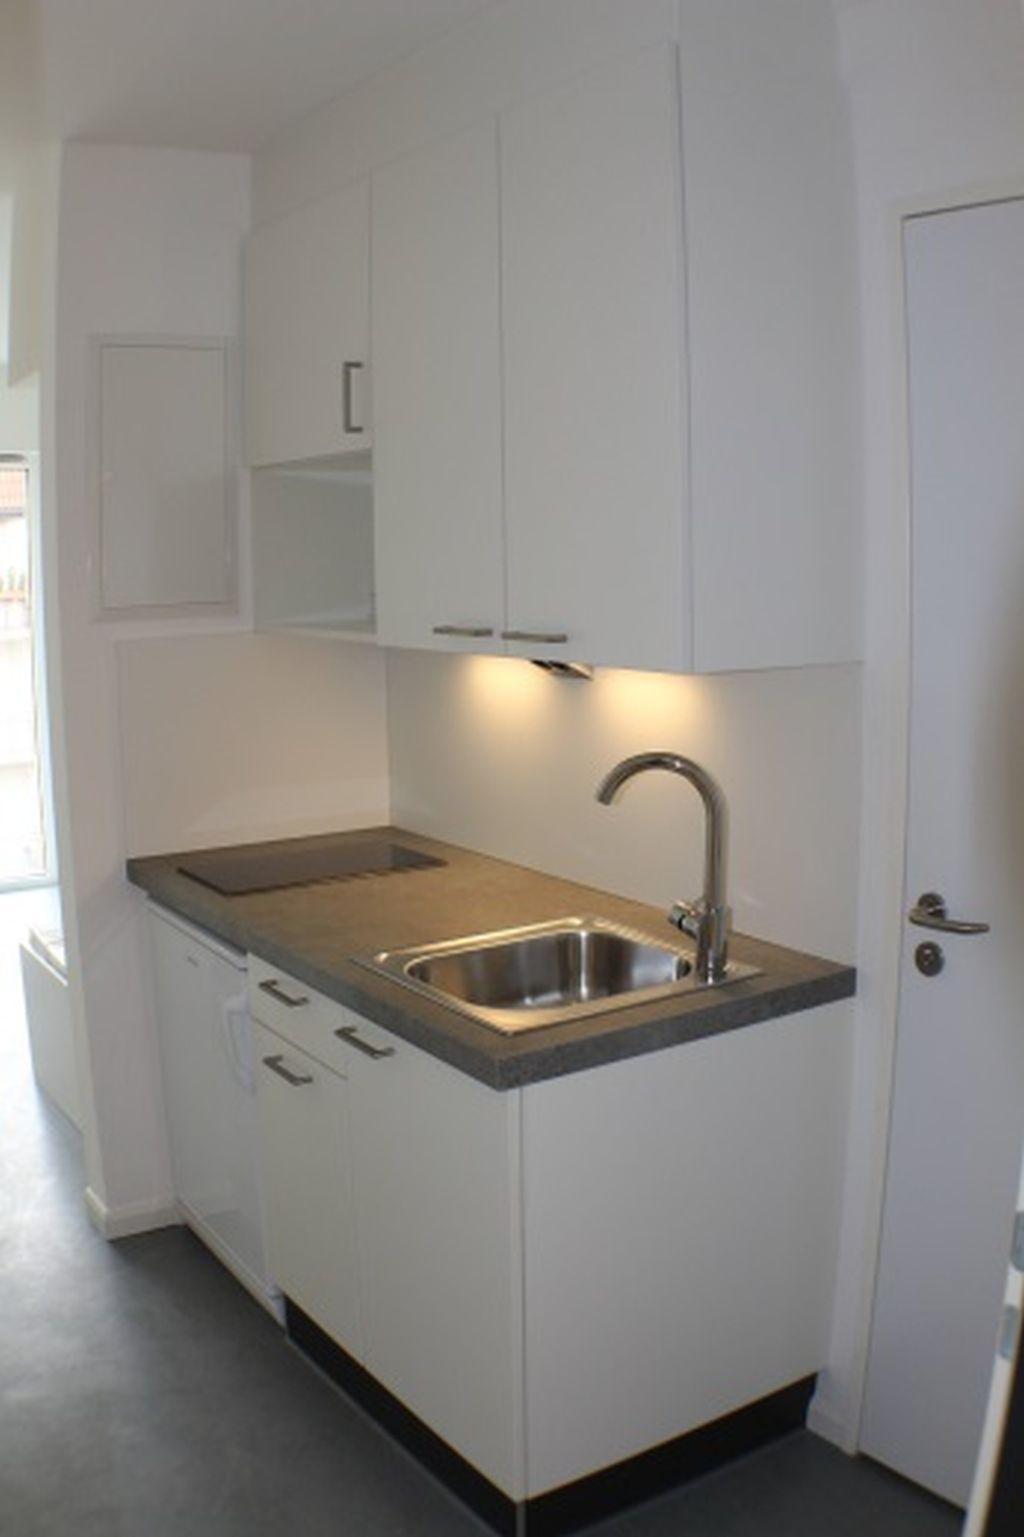 max kade h user frankfurt am main max kade h user in. Black Bedroom Furniture Sets. Home Design Ideas